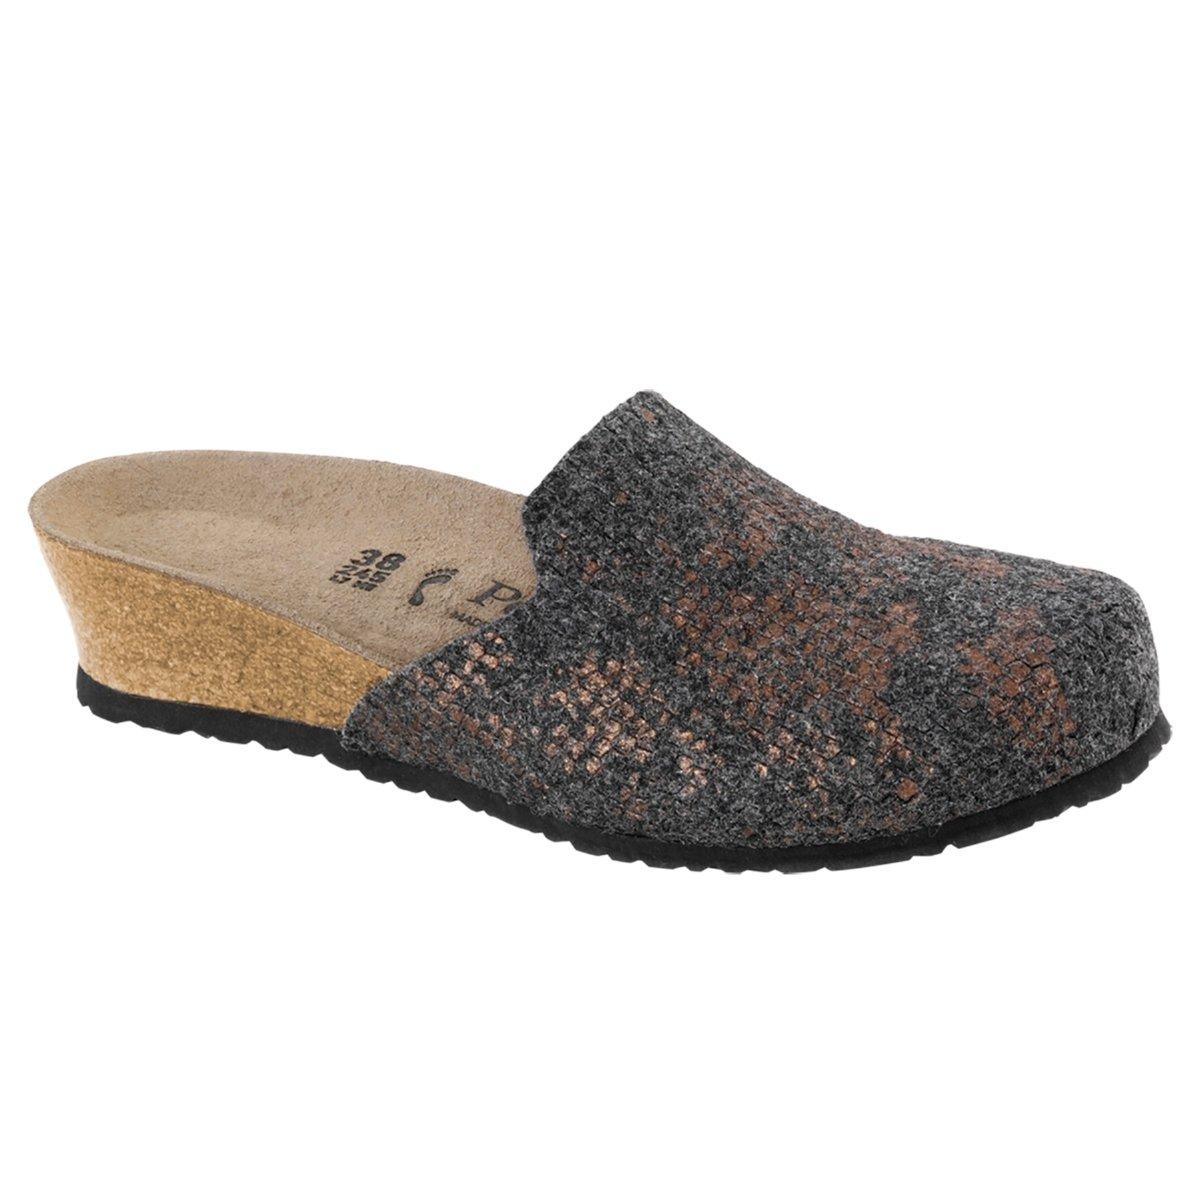 buy popular e5cdf 0ae52 Papillio Schuhe Lucy Wollfilz Schmal: Amazon.co.uk: Shoes & Bags